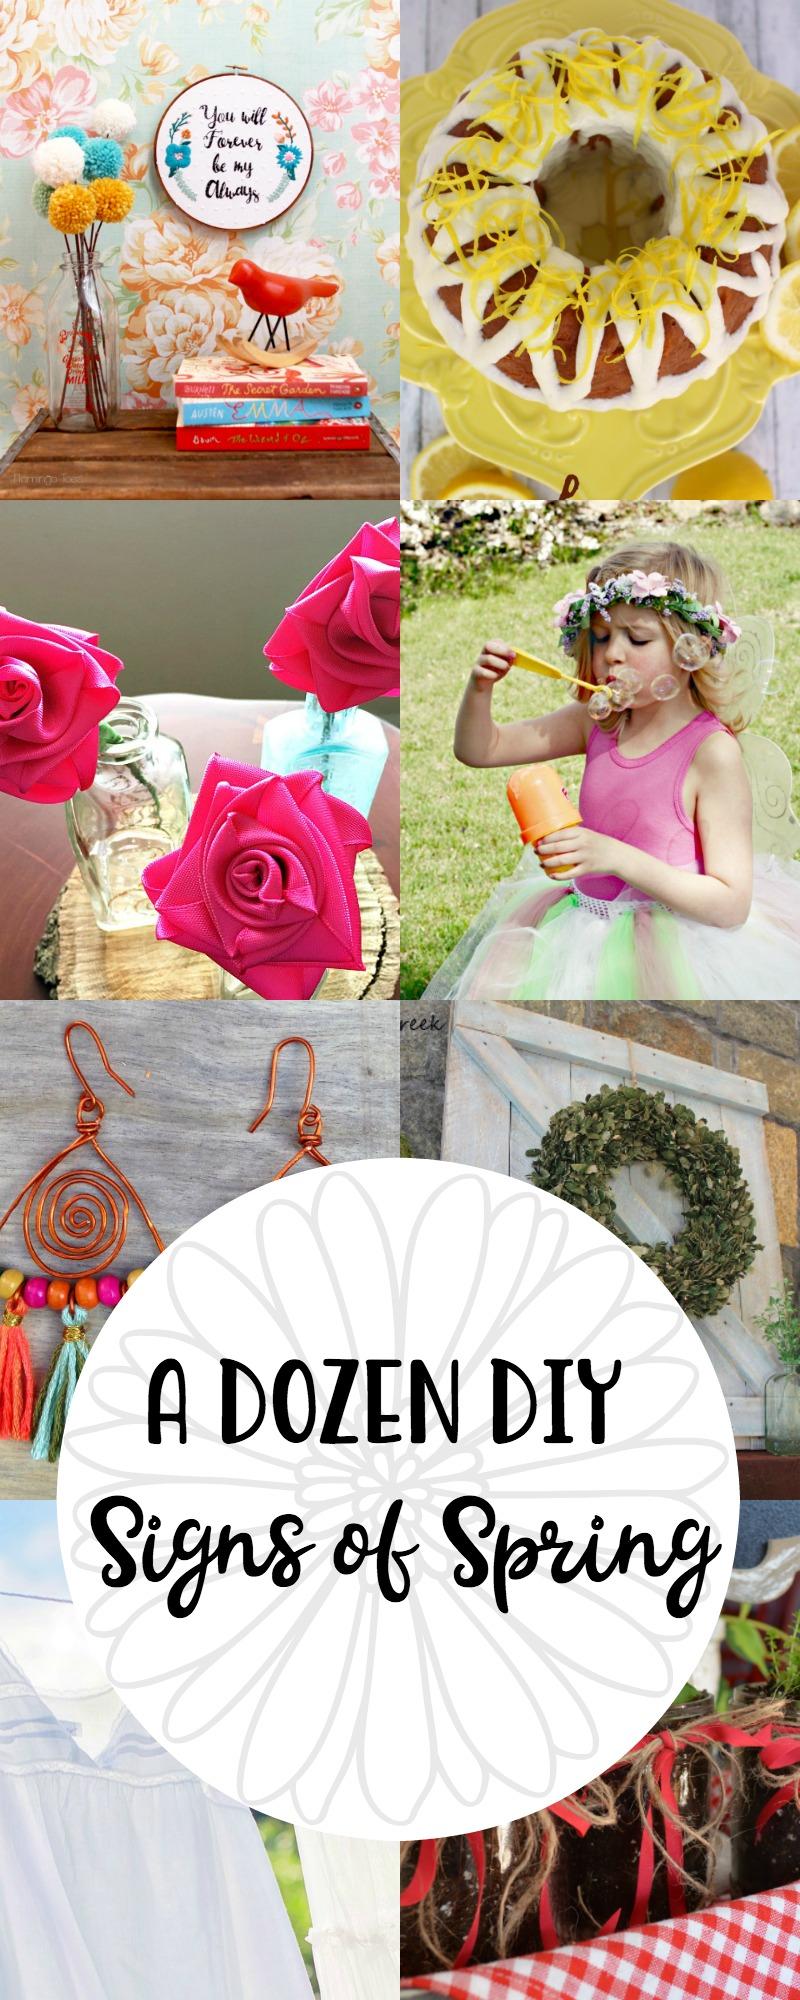 DIY Signs of Spring